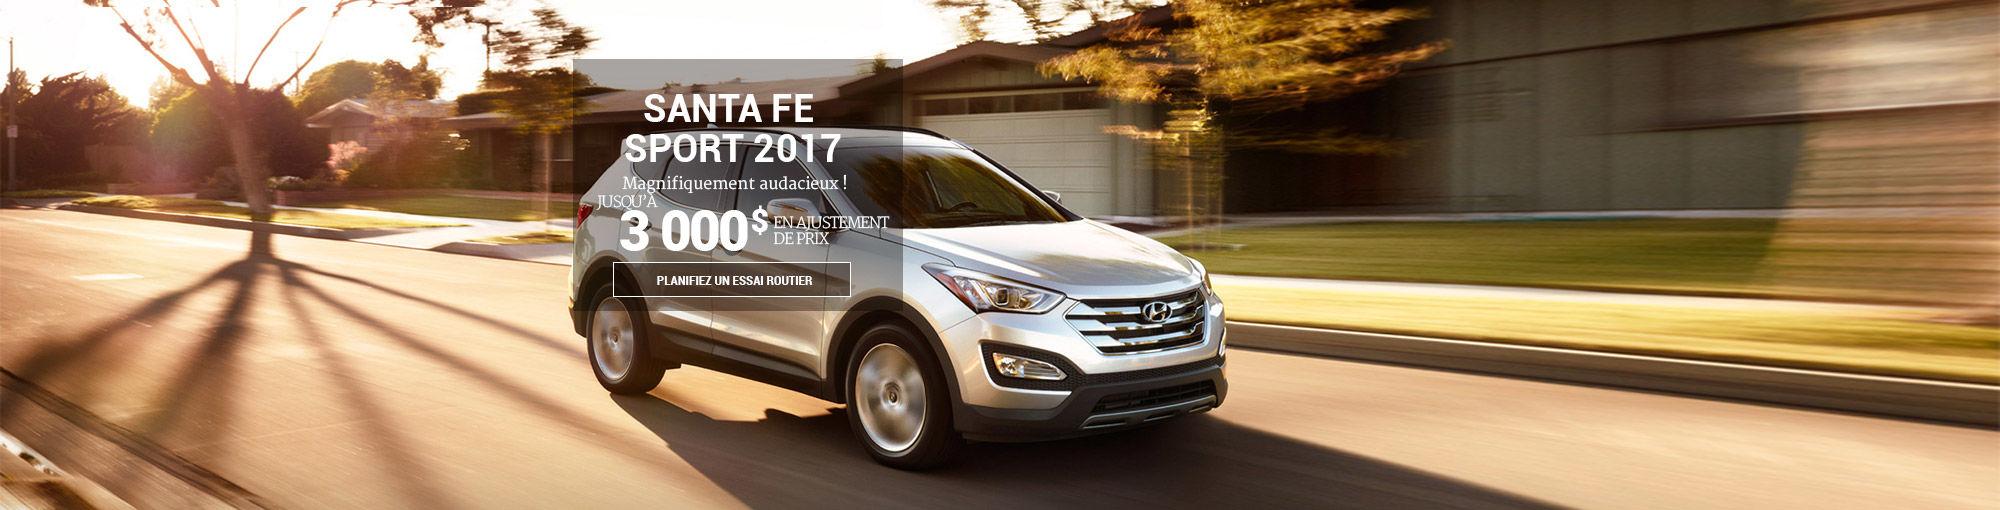 Hyundai Santa Fe Sport 2017 juin